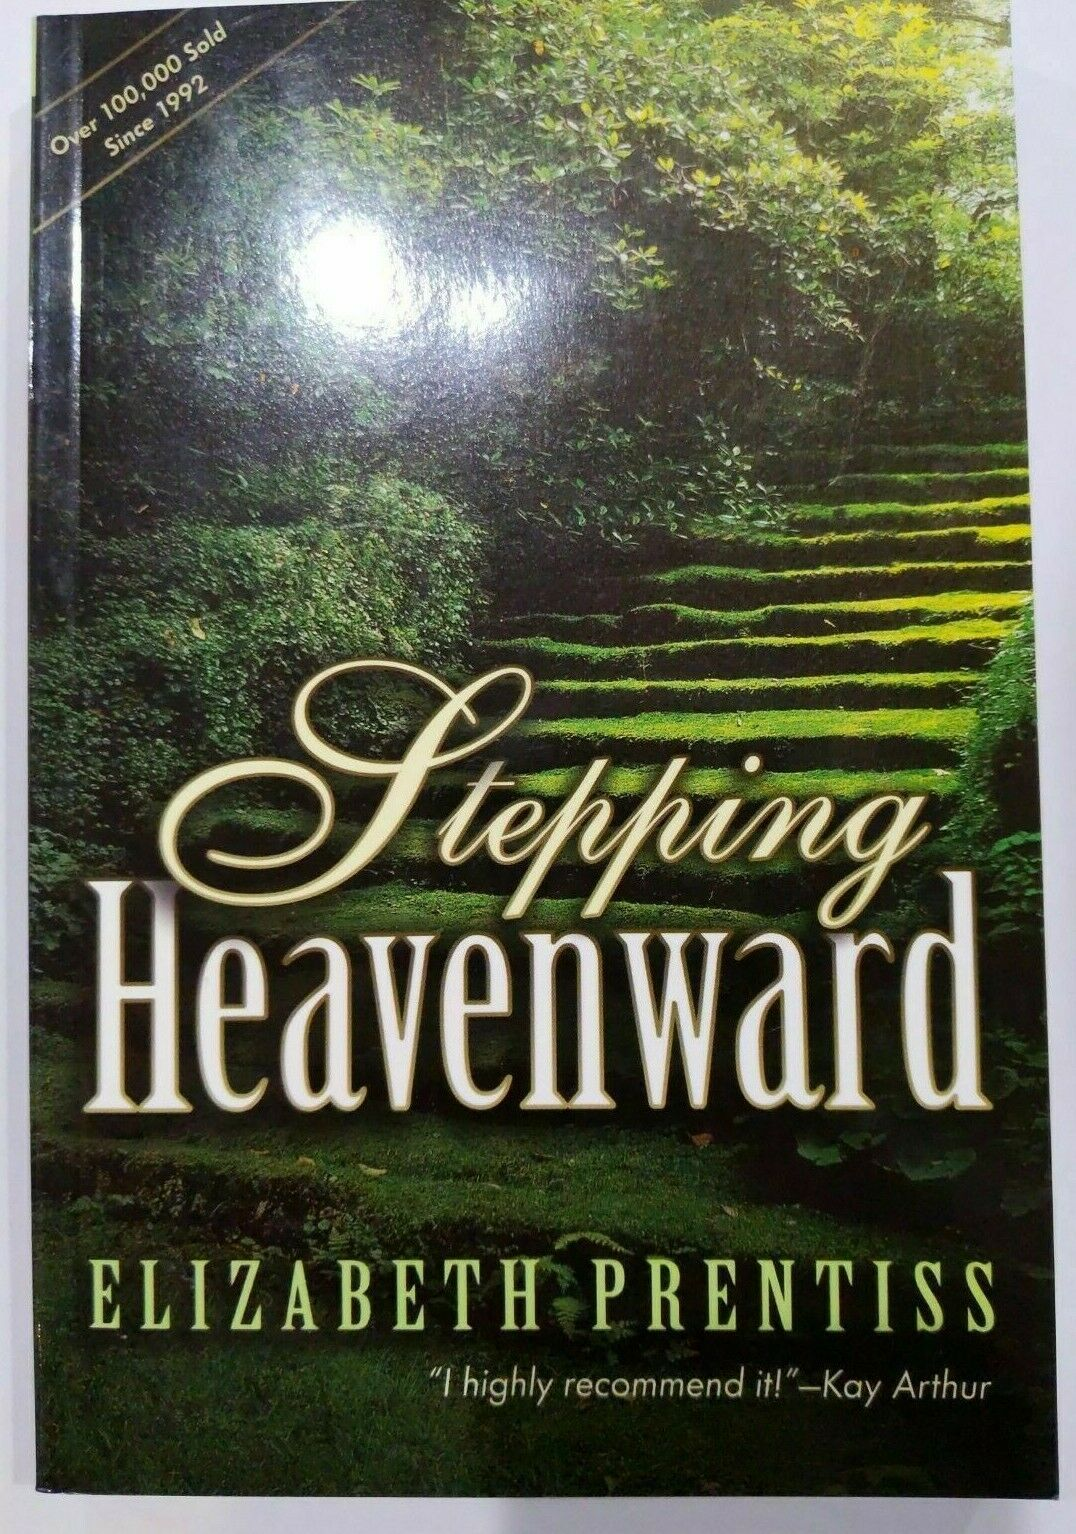 Stepping Heavenward By Elizabeth Prentiss 2001 Paperback Book - $1.17